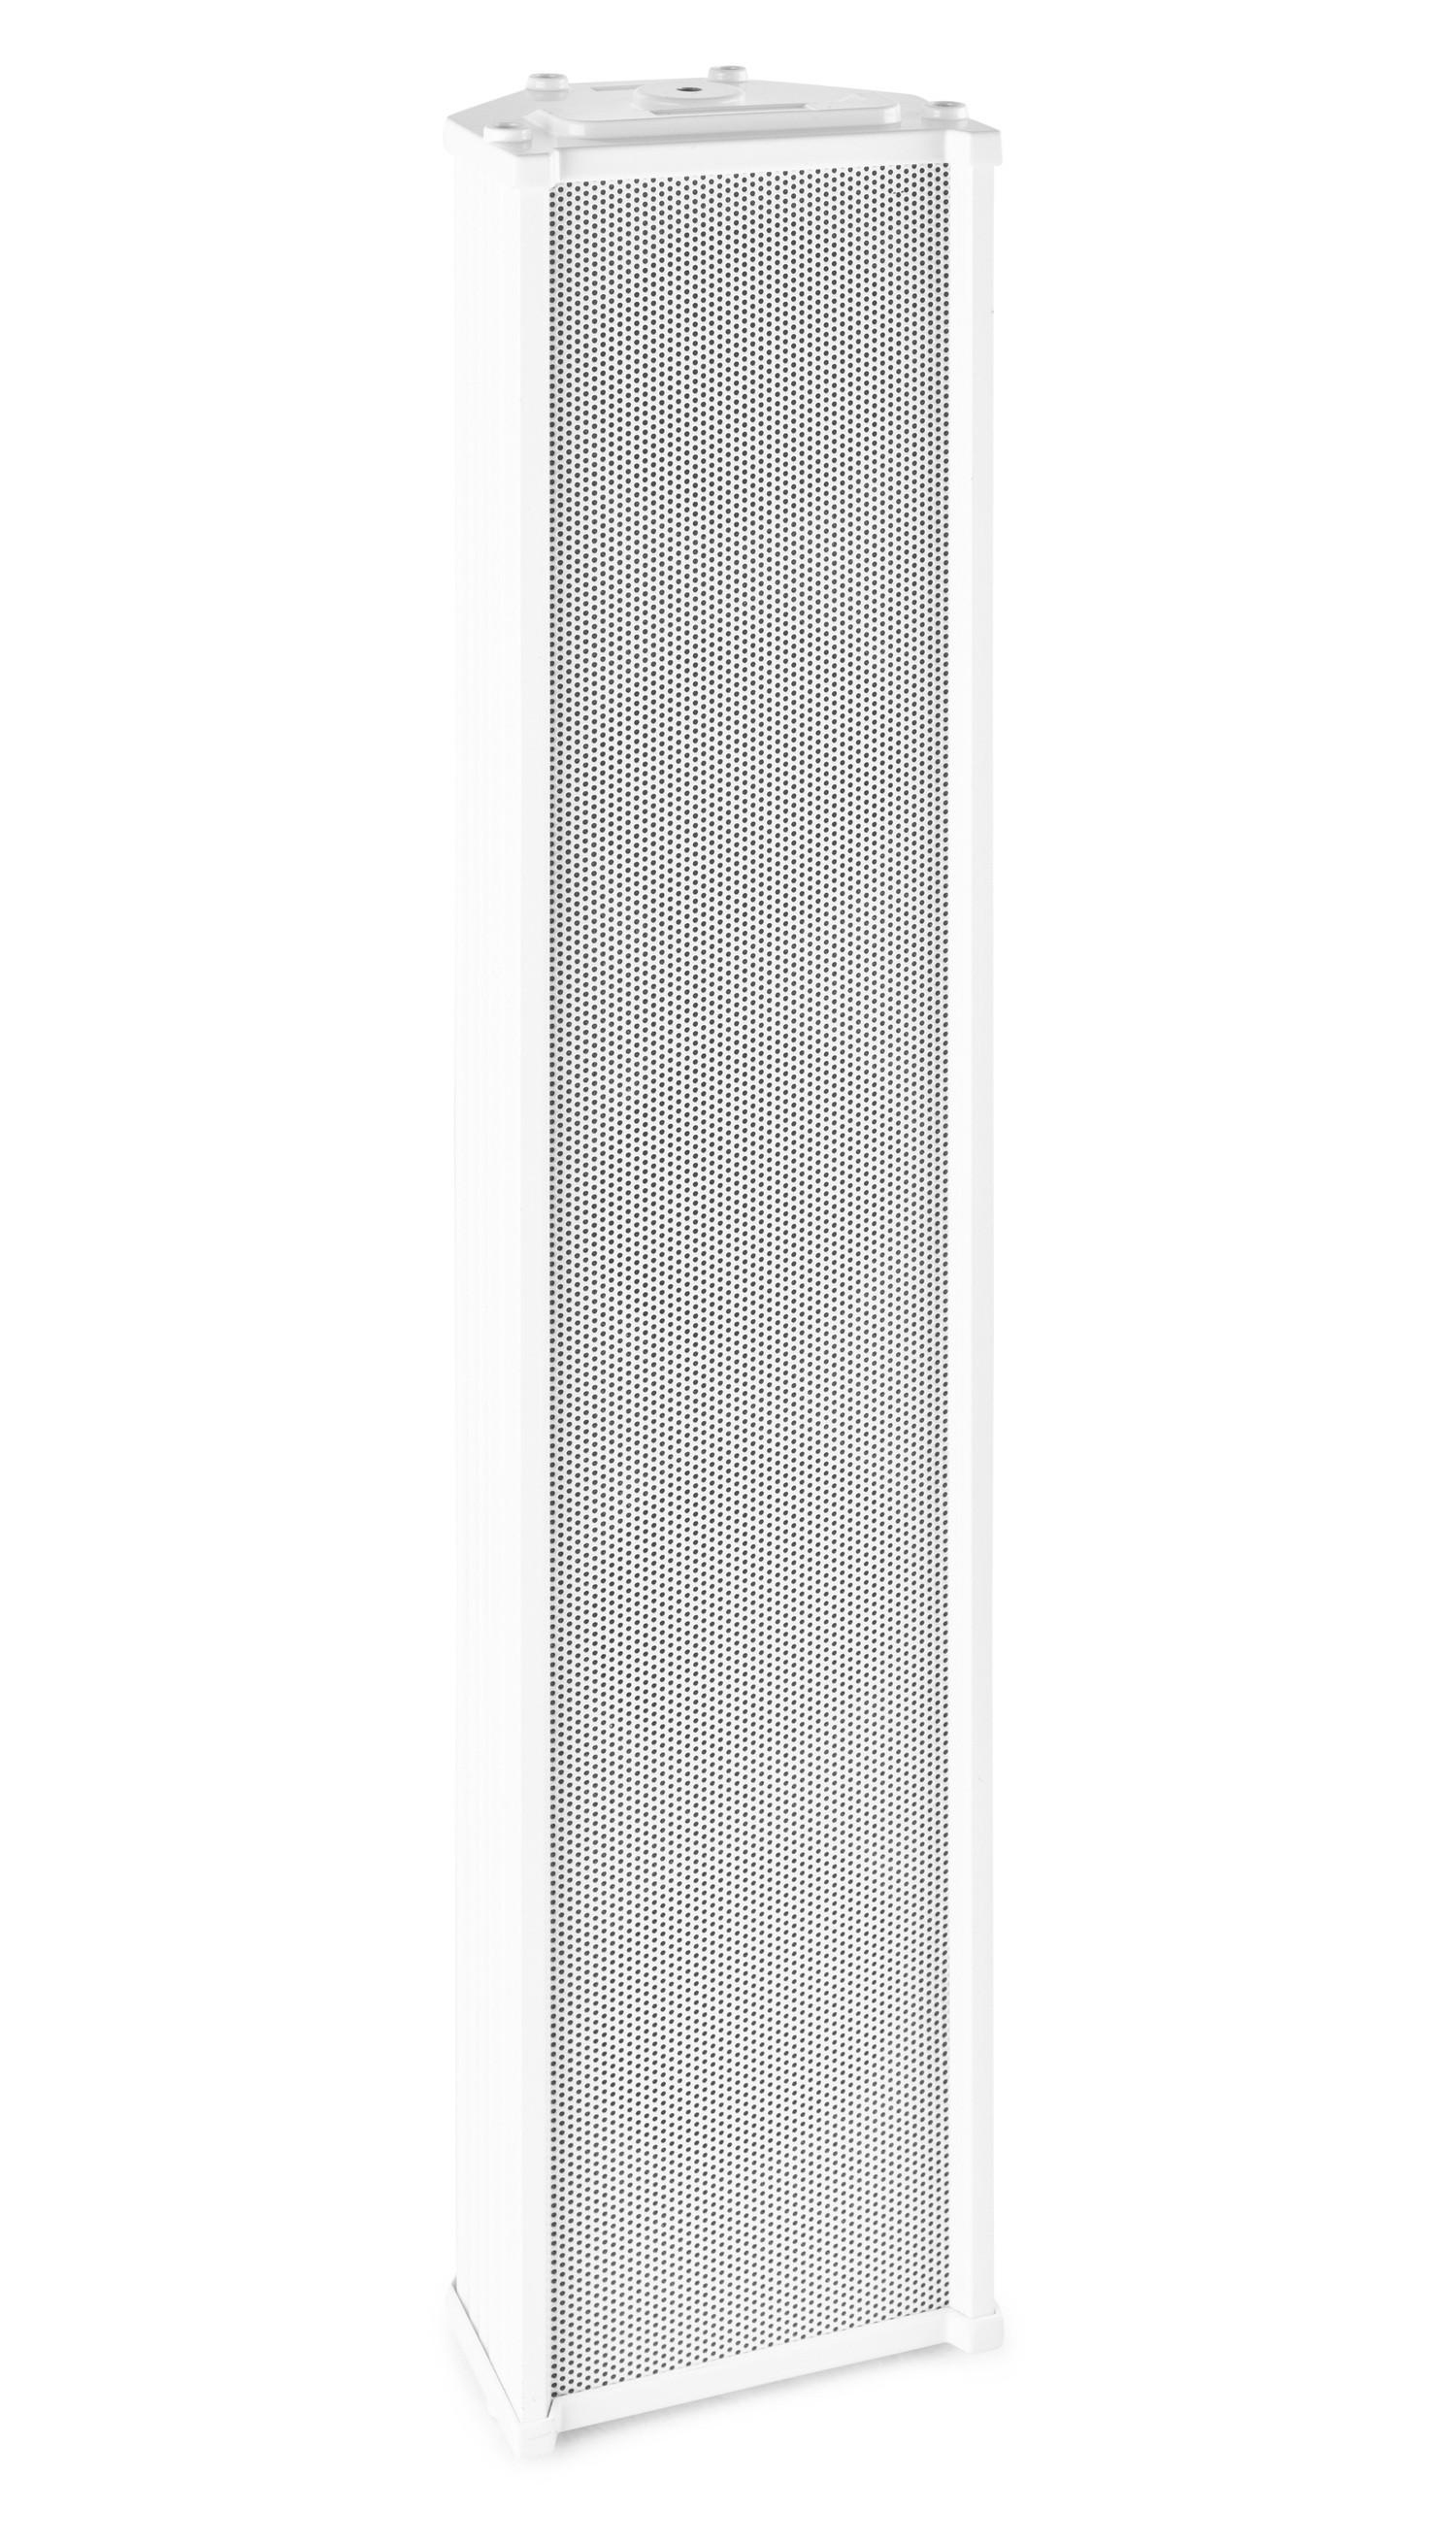 Boxe coloană 100V, 50W RMS, IPX4, Power Dynamics OCS5